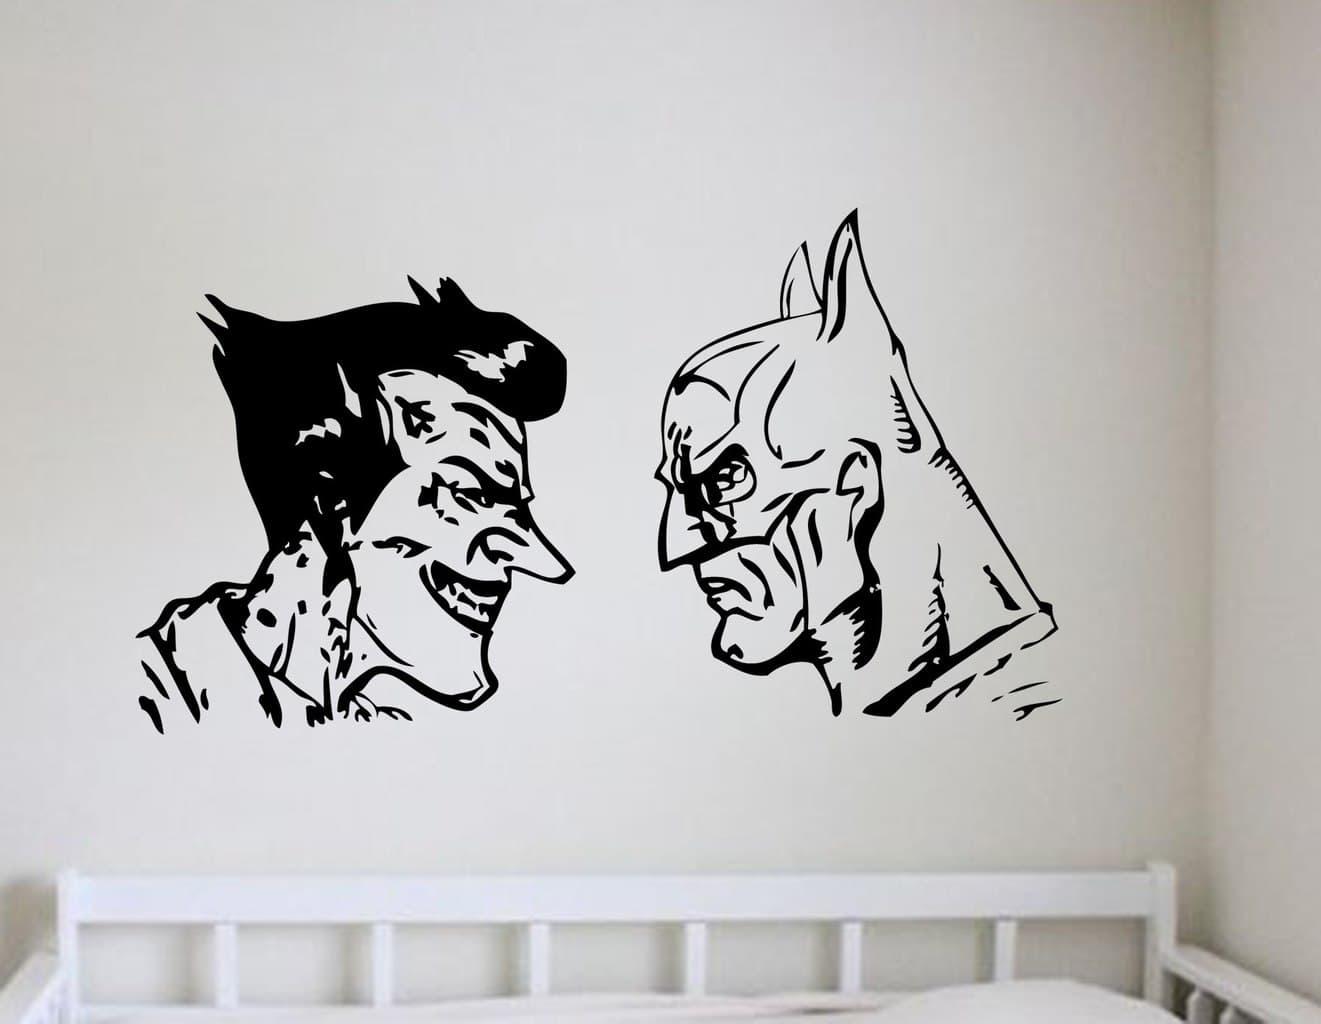 Batman And Joker Wall Art Decal | Wall Decal | Wall Art With Regard To Current Batman Wall Art (View 3 of 20)